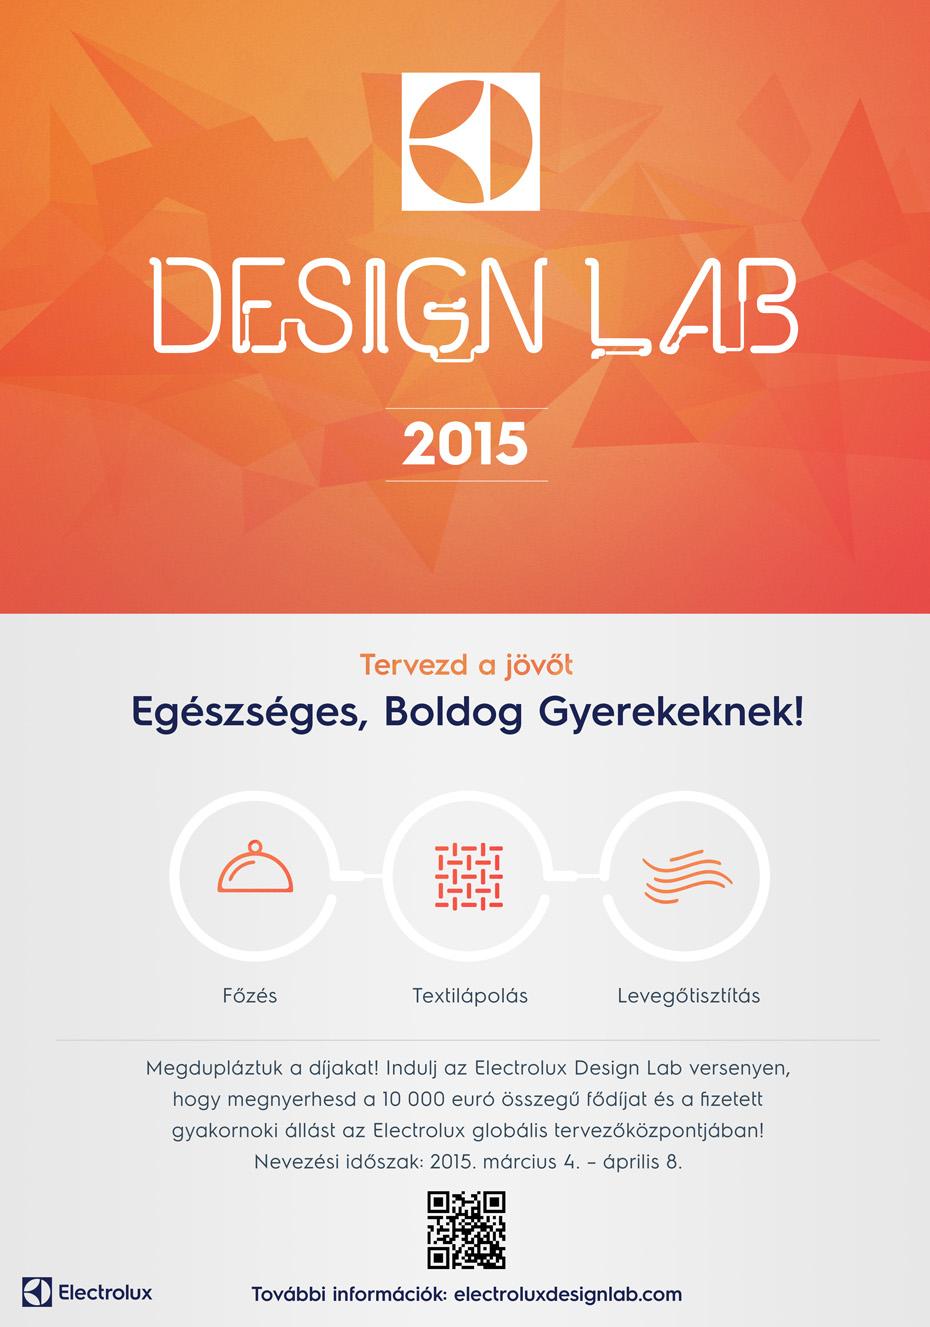 Electrolux_DesignLab_Poster_2015 930